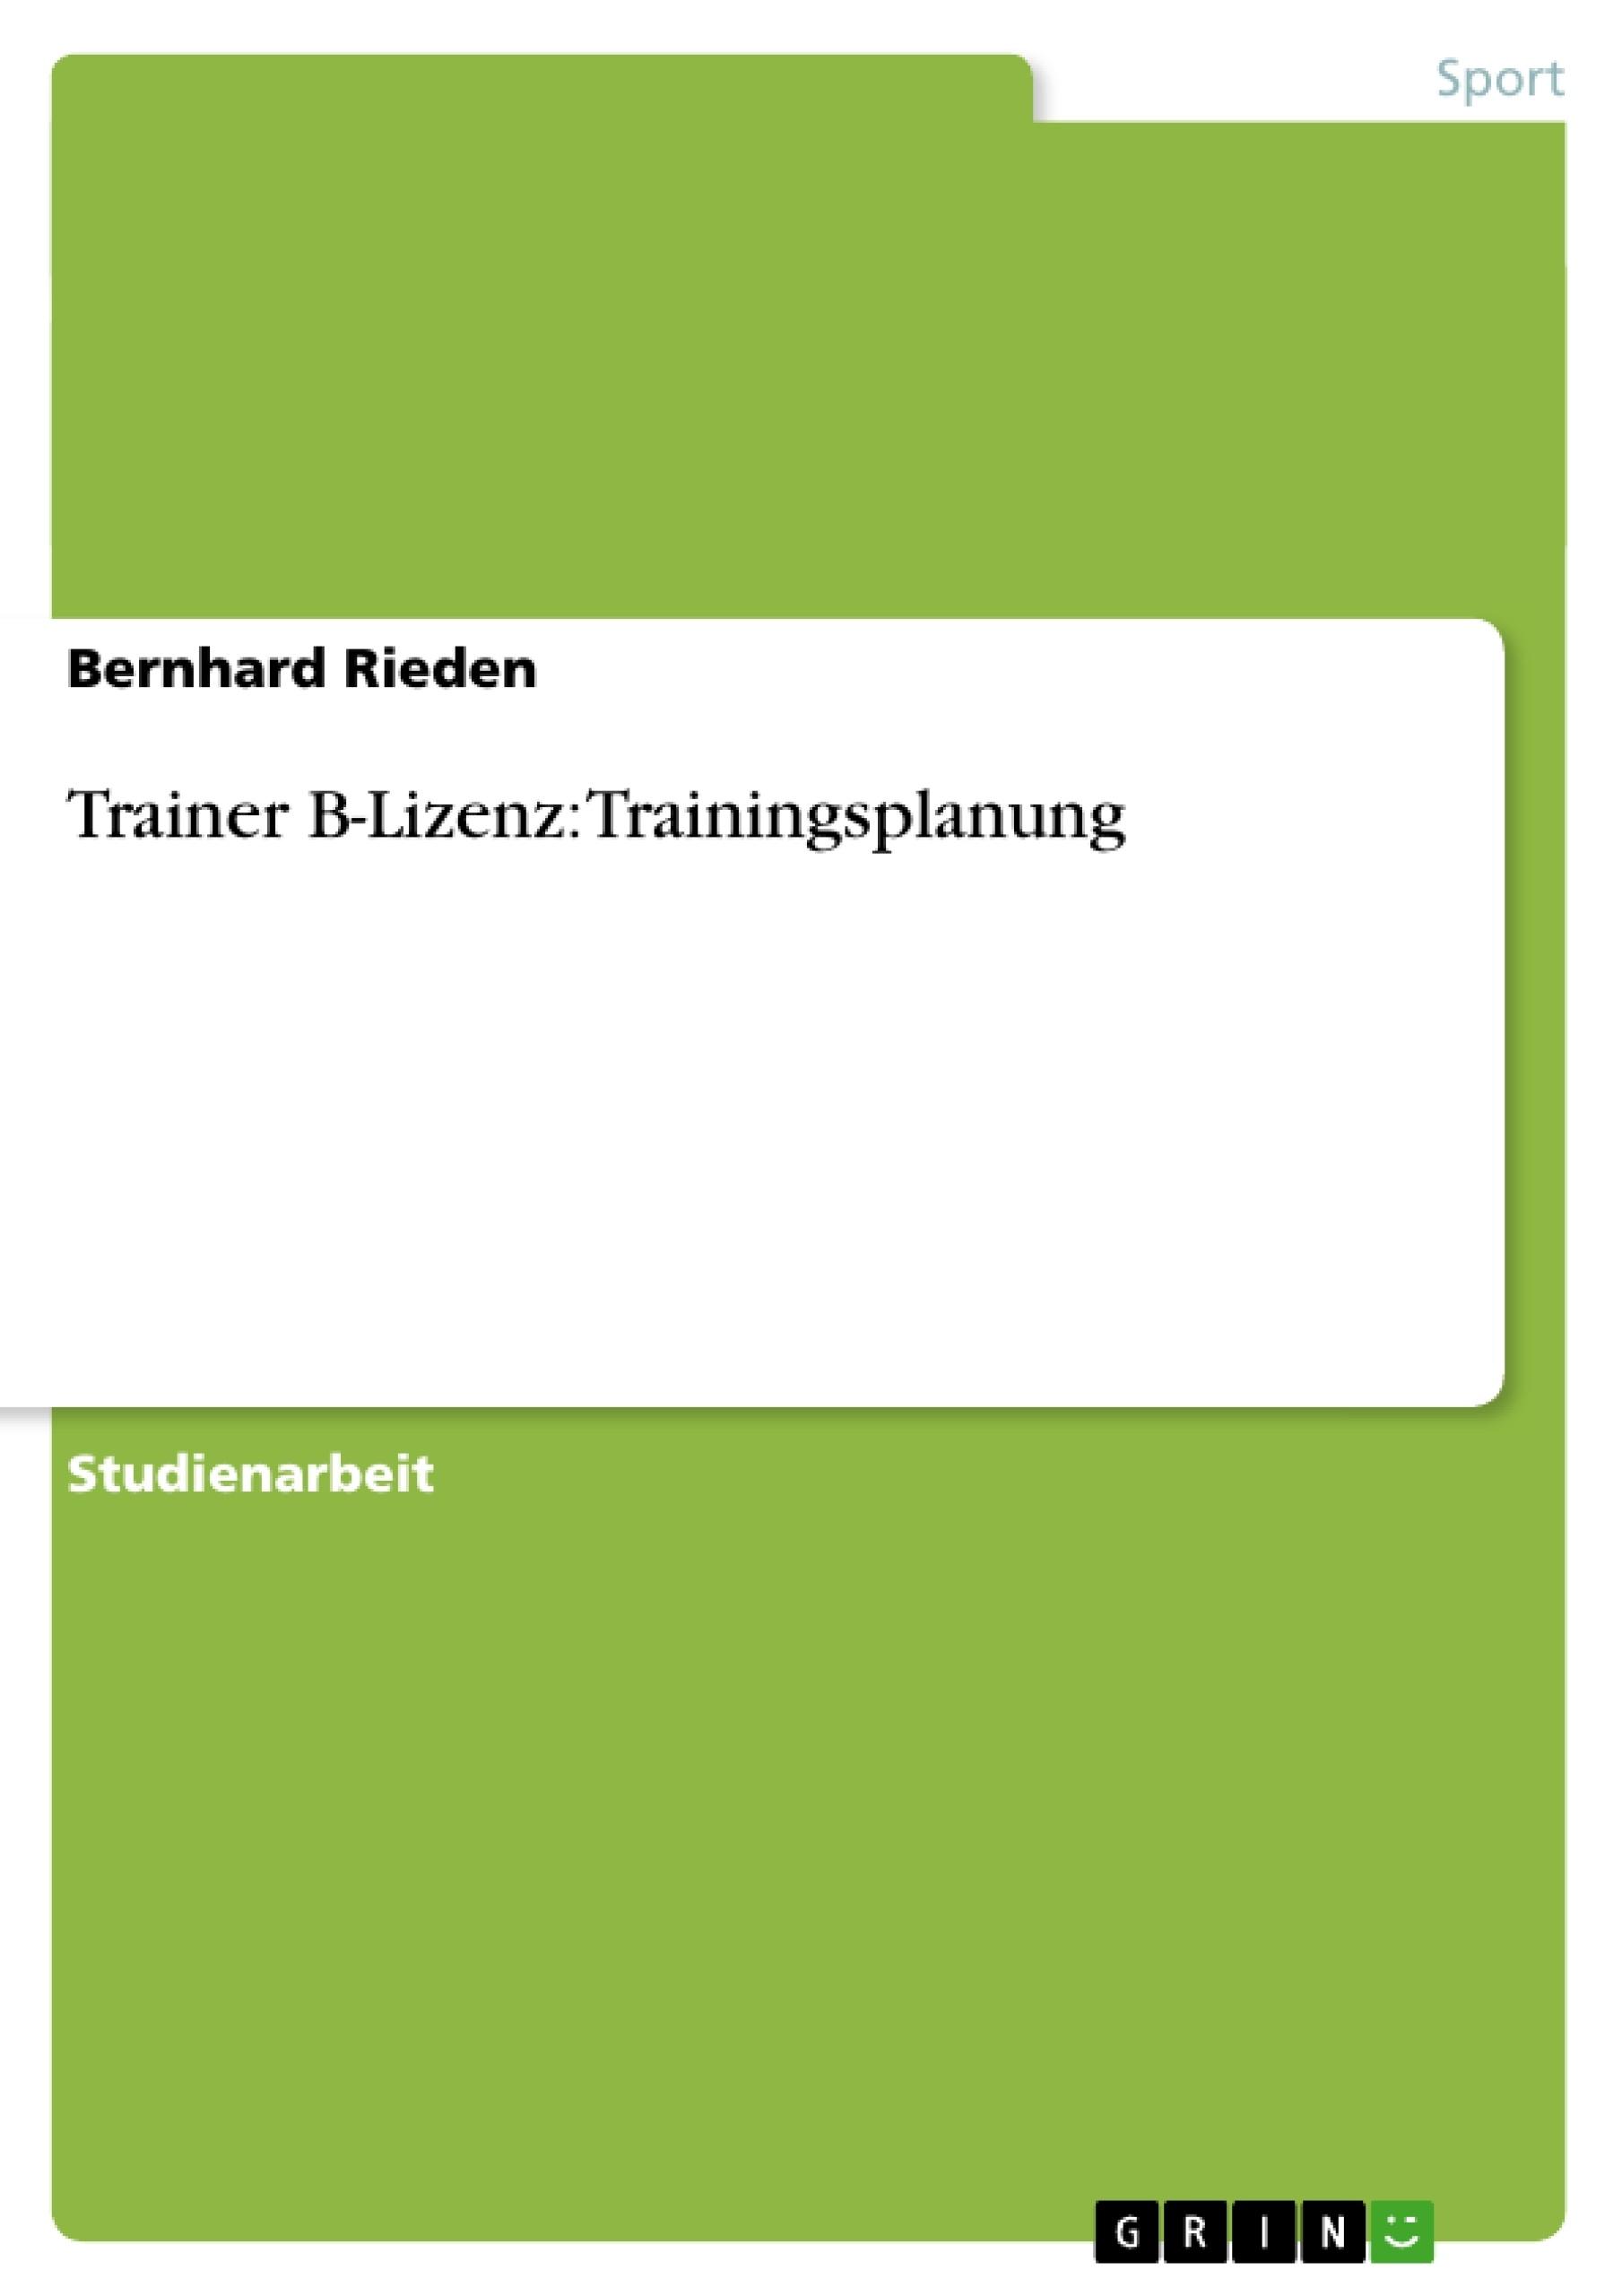 Titel: Trainer B-Lizenz: Trainingsplanung